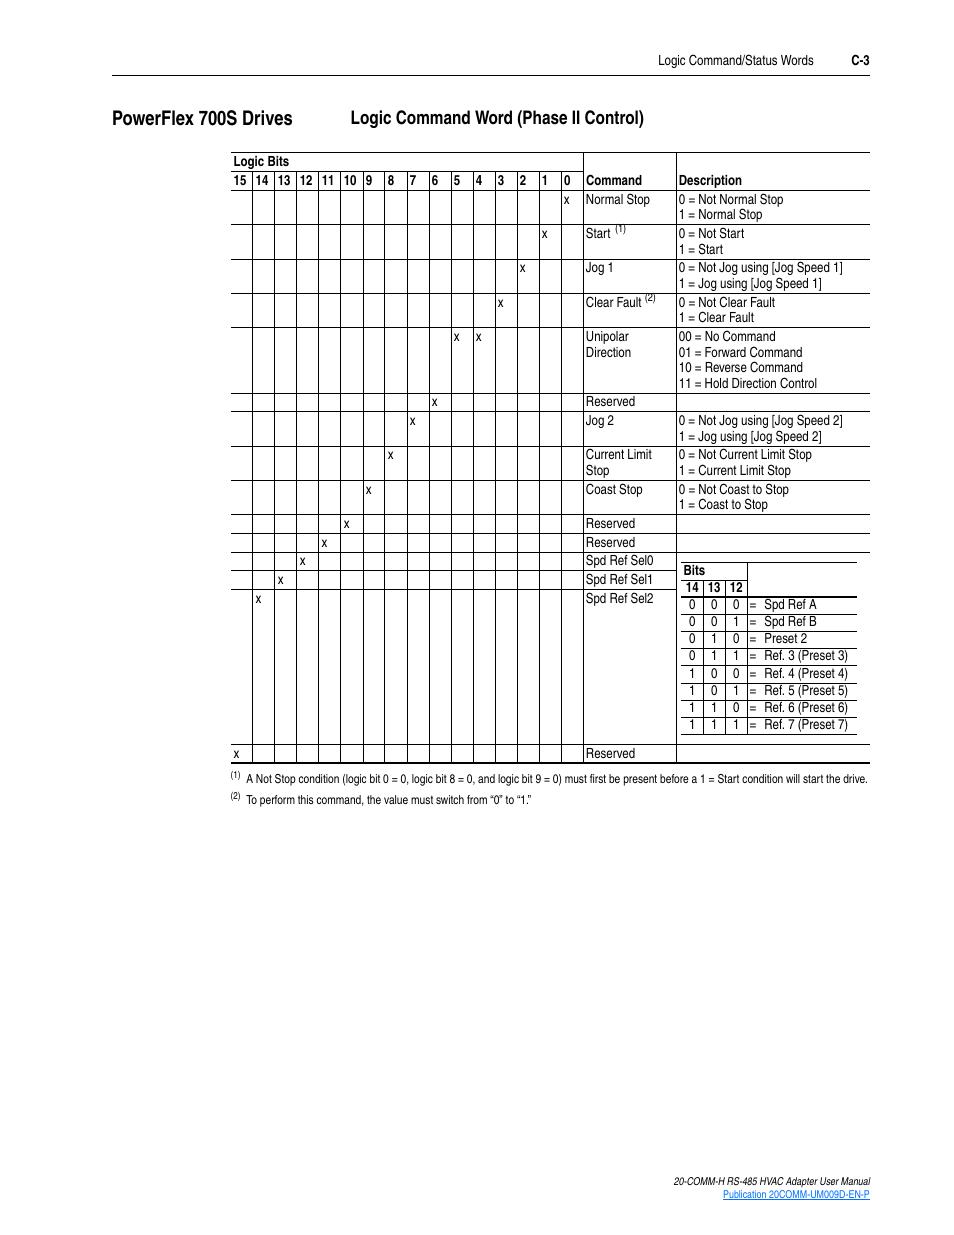 Powerflex 700s drives, Logic command word (phase ii